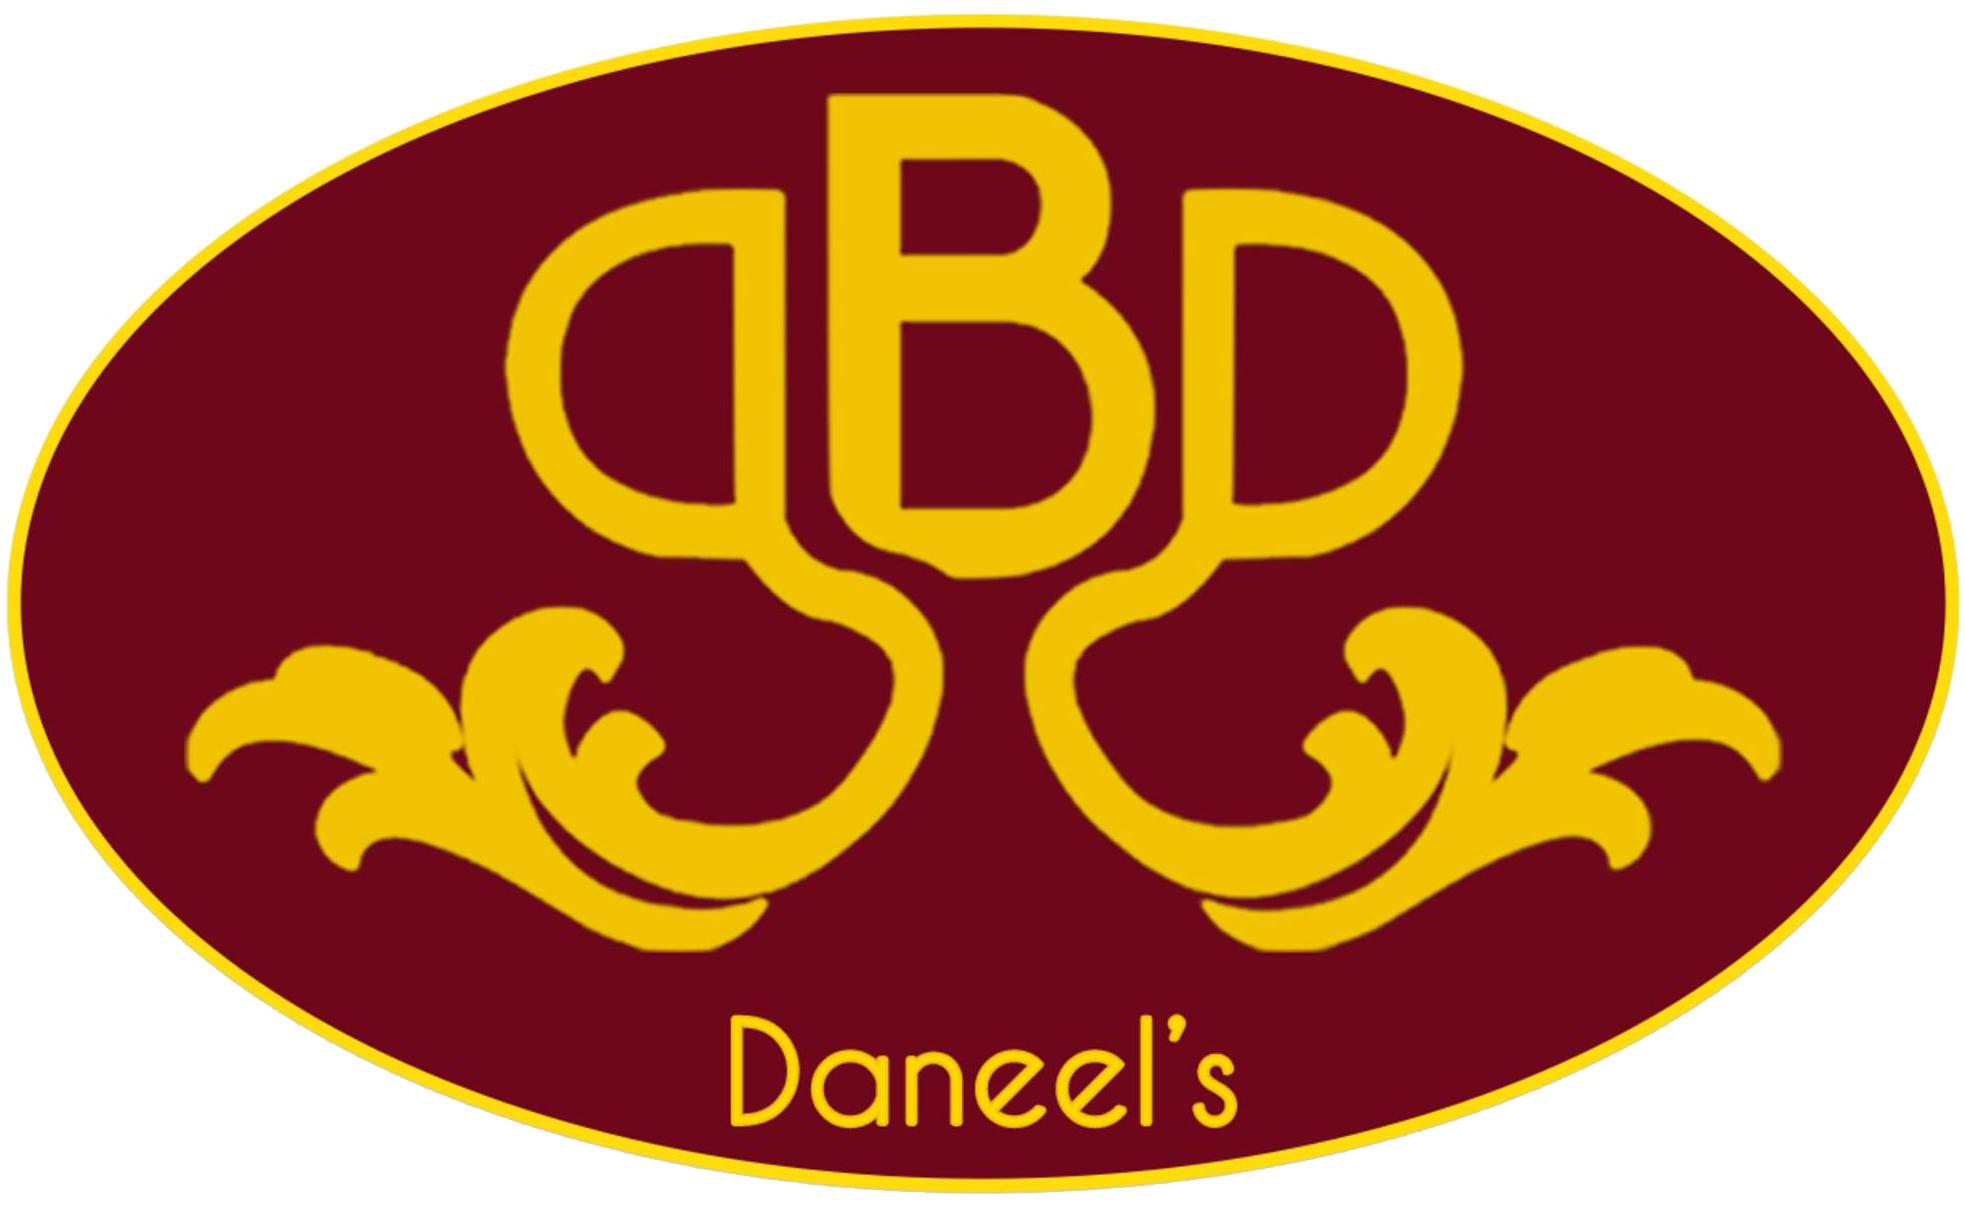 Le Daneel's D